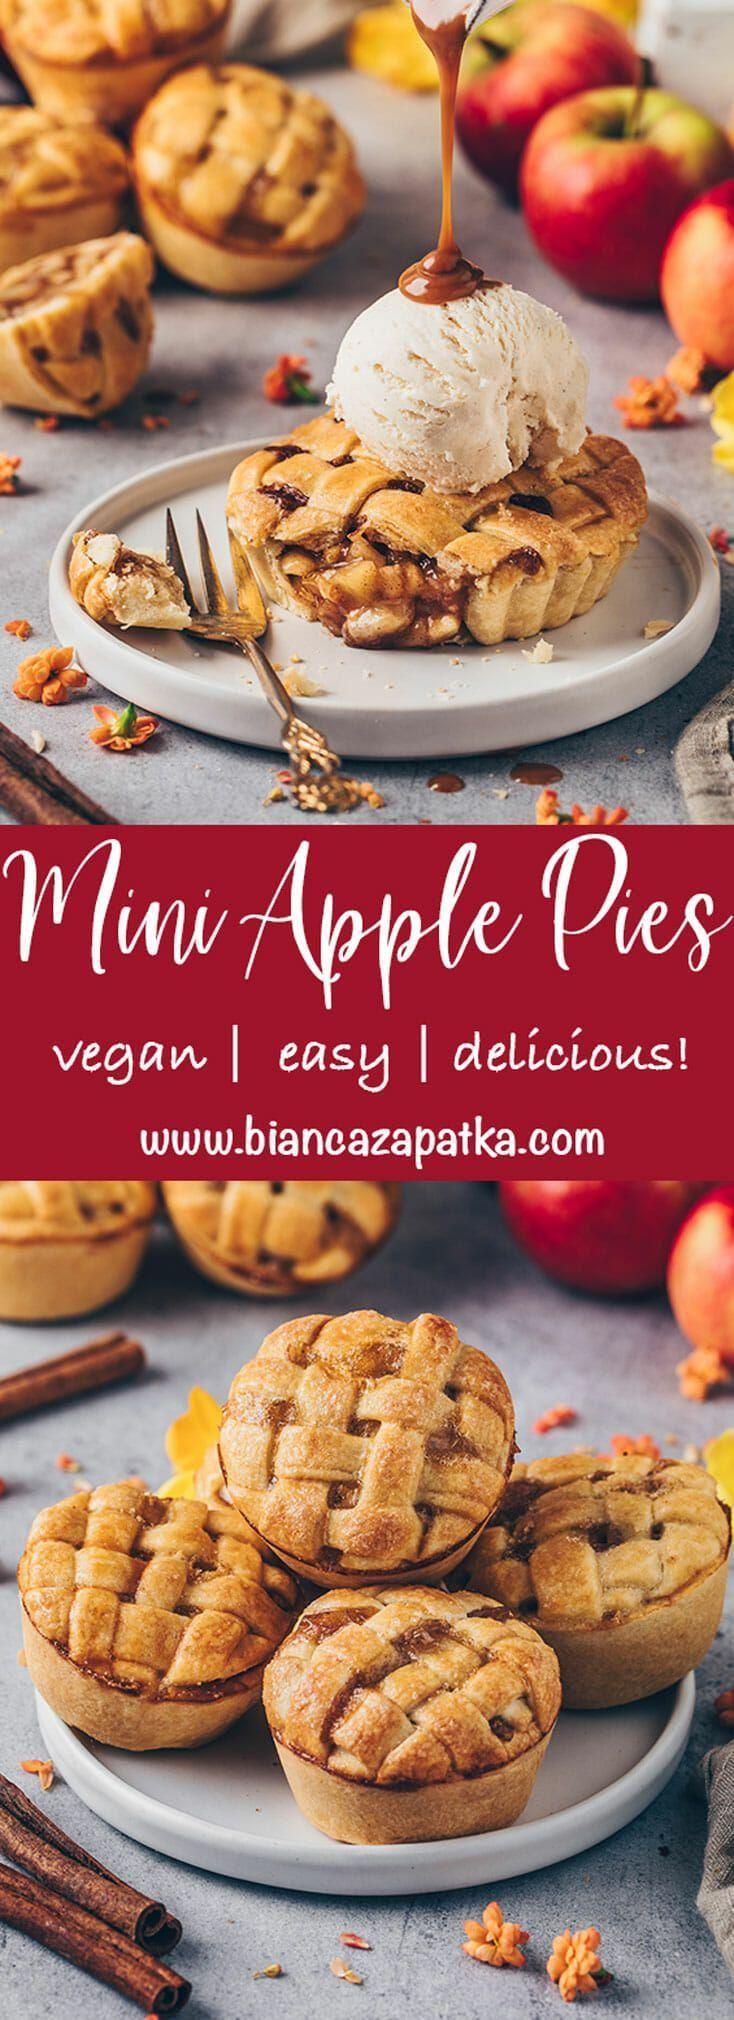 Mini Apple Pies | Vegan Apple Pie Tarts - Bianca Zapatka | Recipes  - Vegane Desserts -